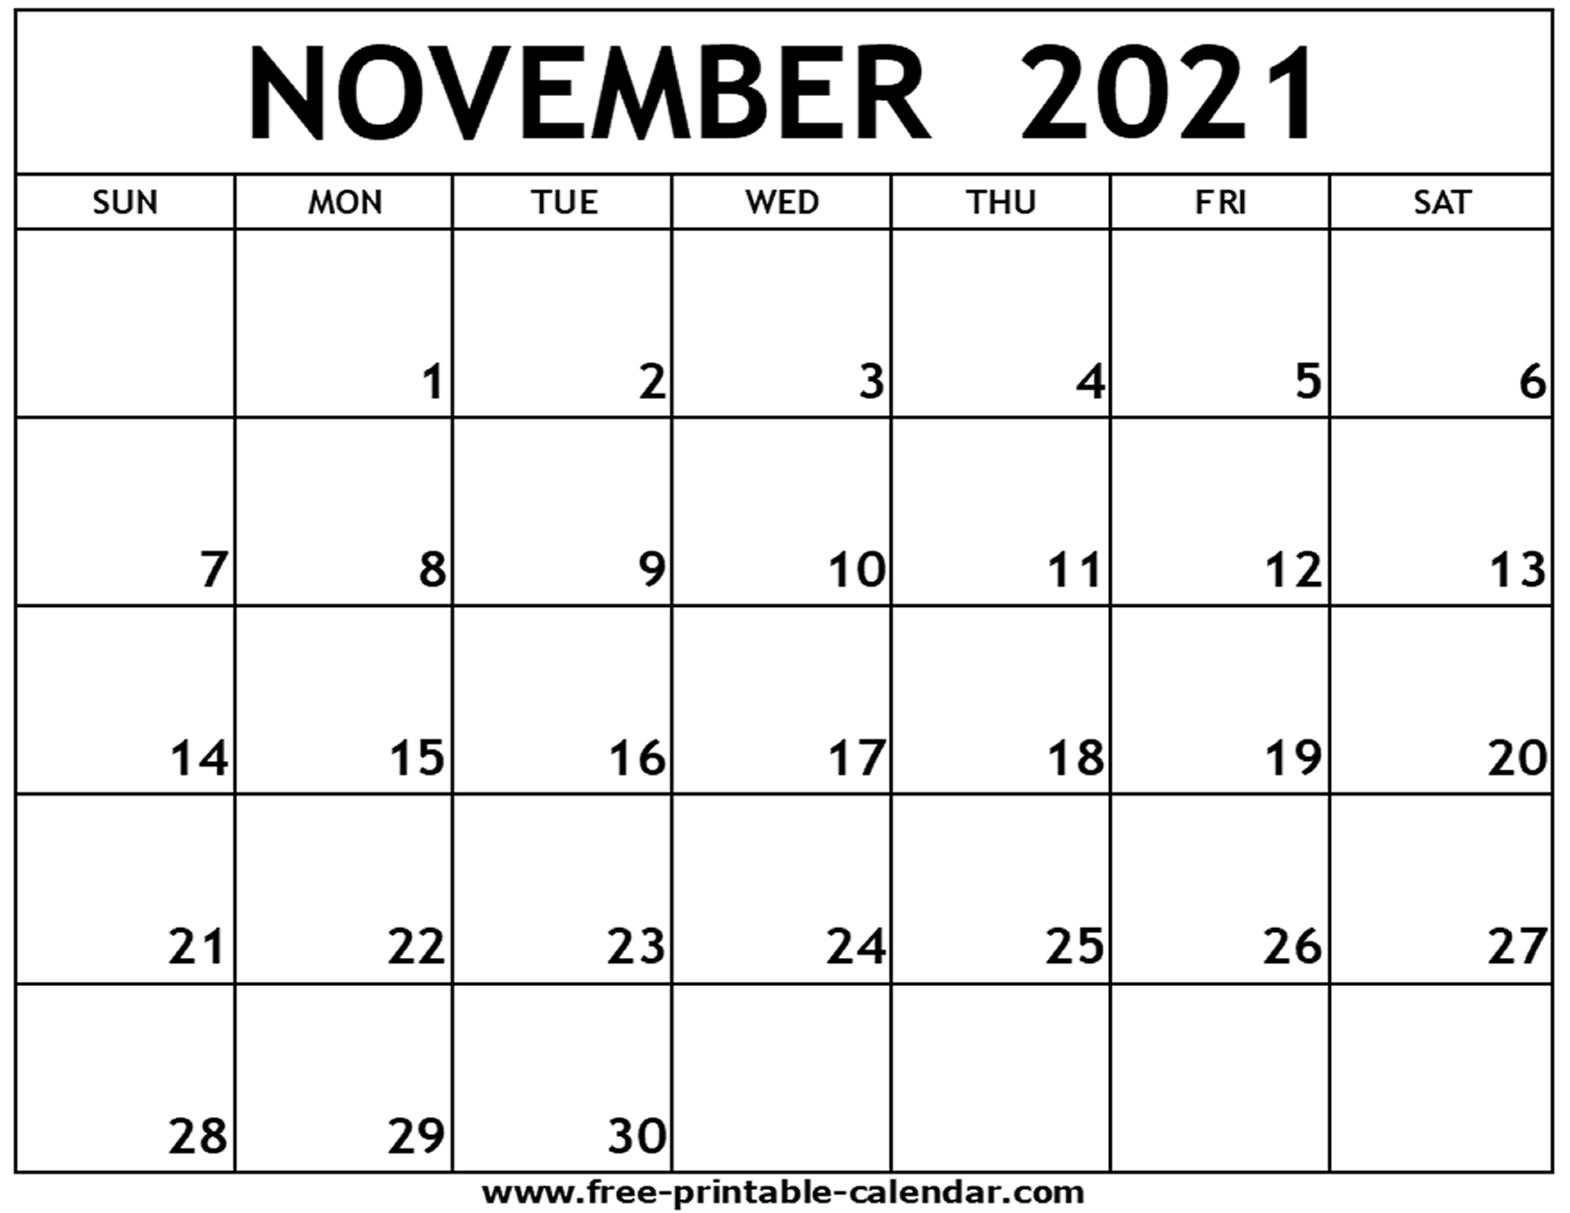 November 2021 Printable Calendar - Free-Printable-Calendar